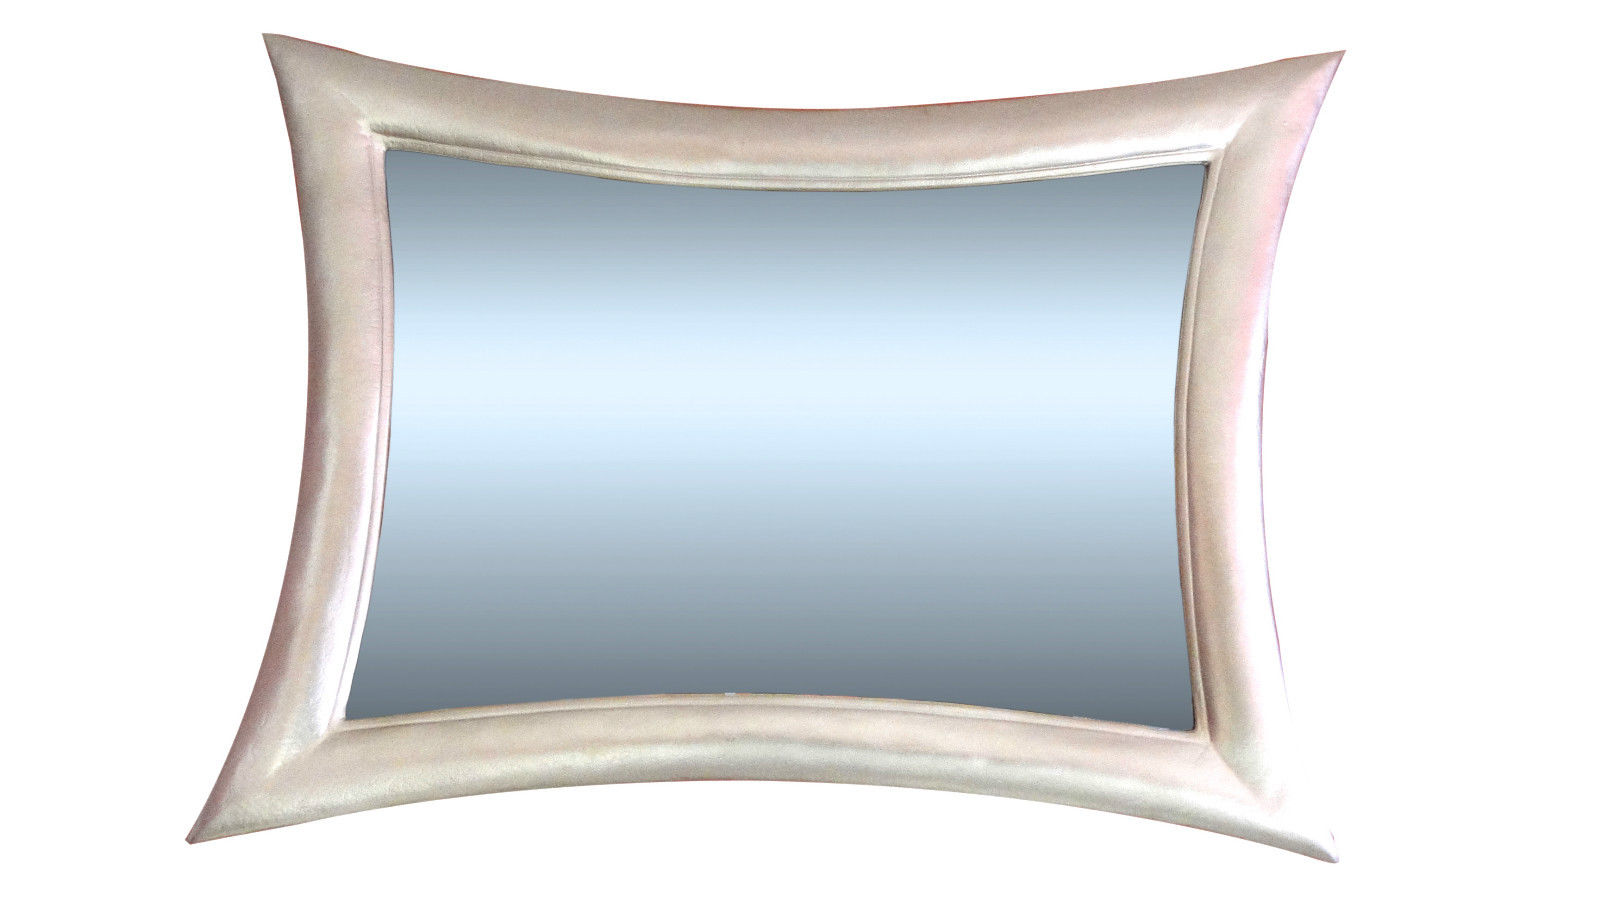 Wandspiegel Spiegel Modern Weiss115x85 Holzrahmen Retro Flurspiegel ...